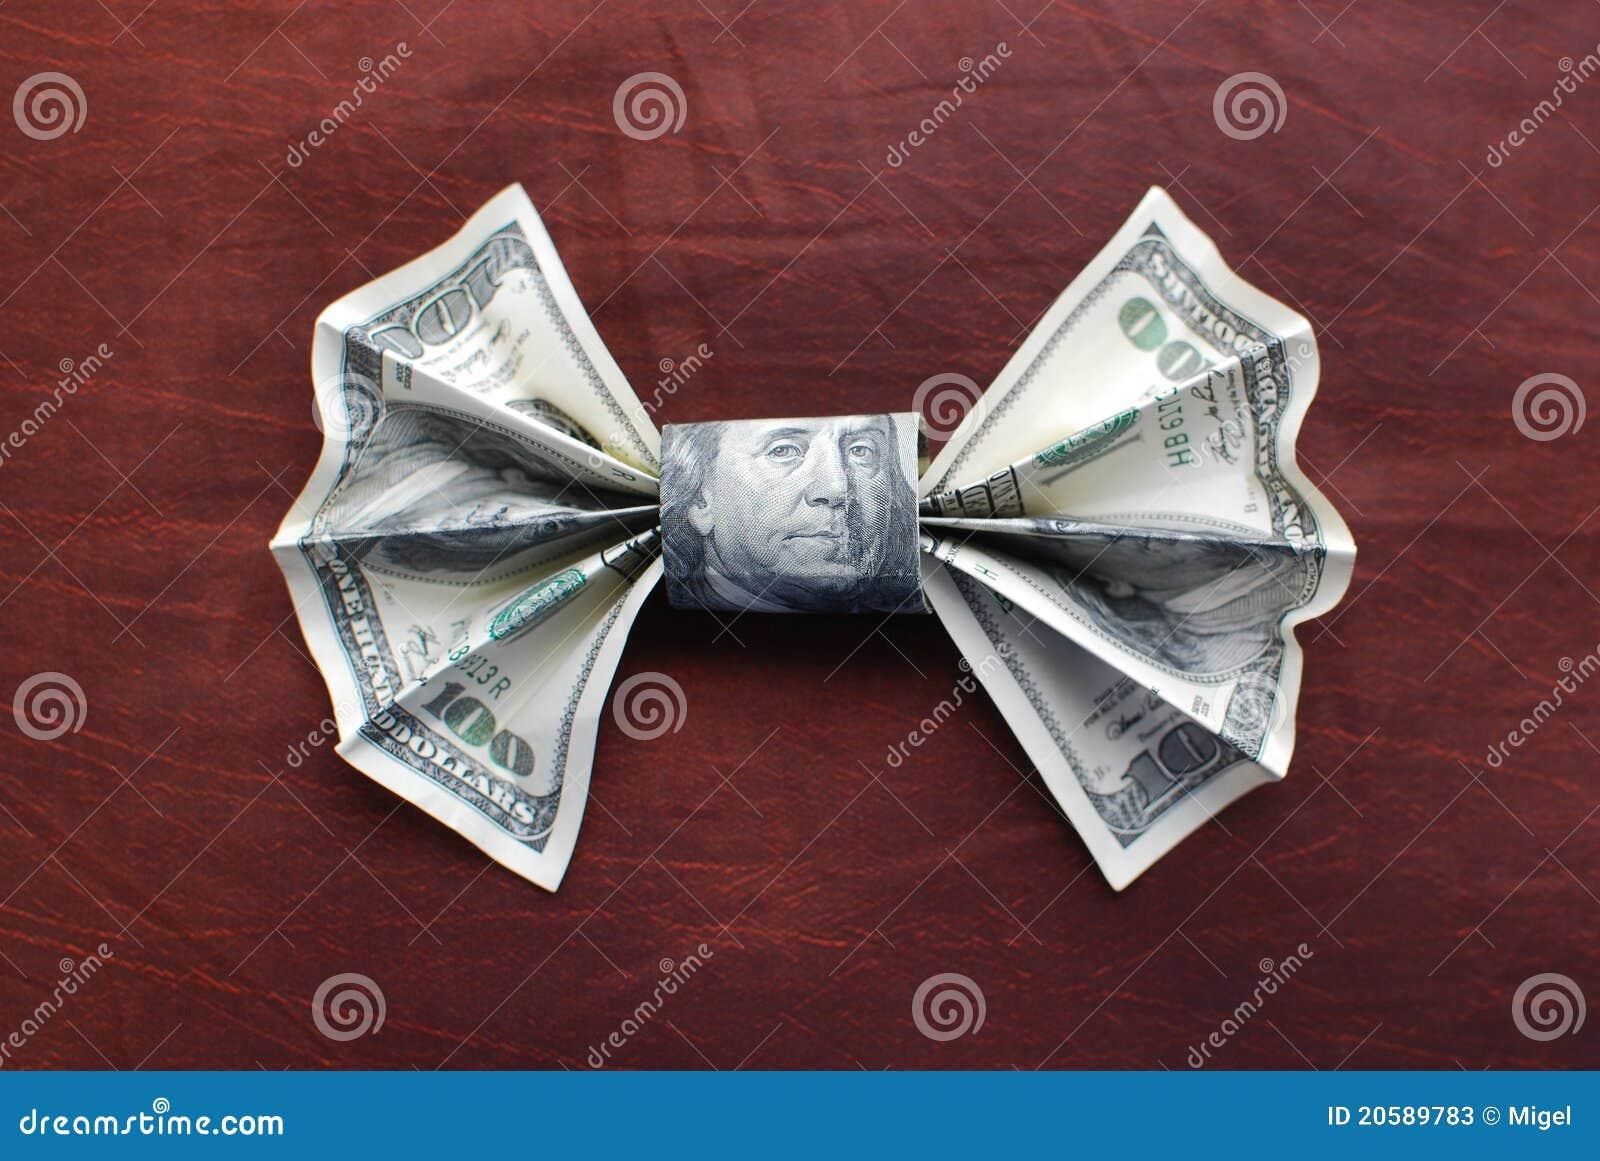 Origami Bow Tie Stock Photos - Image: 20589783 - photo#31